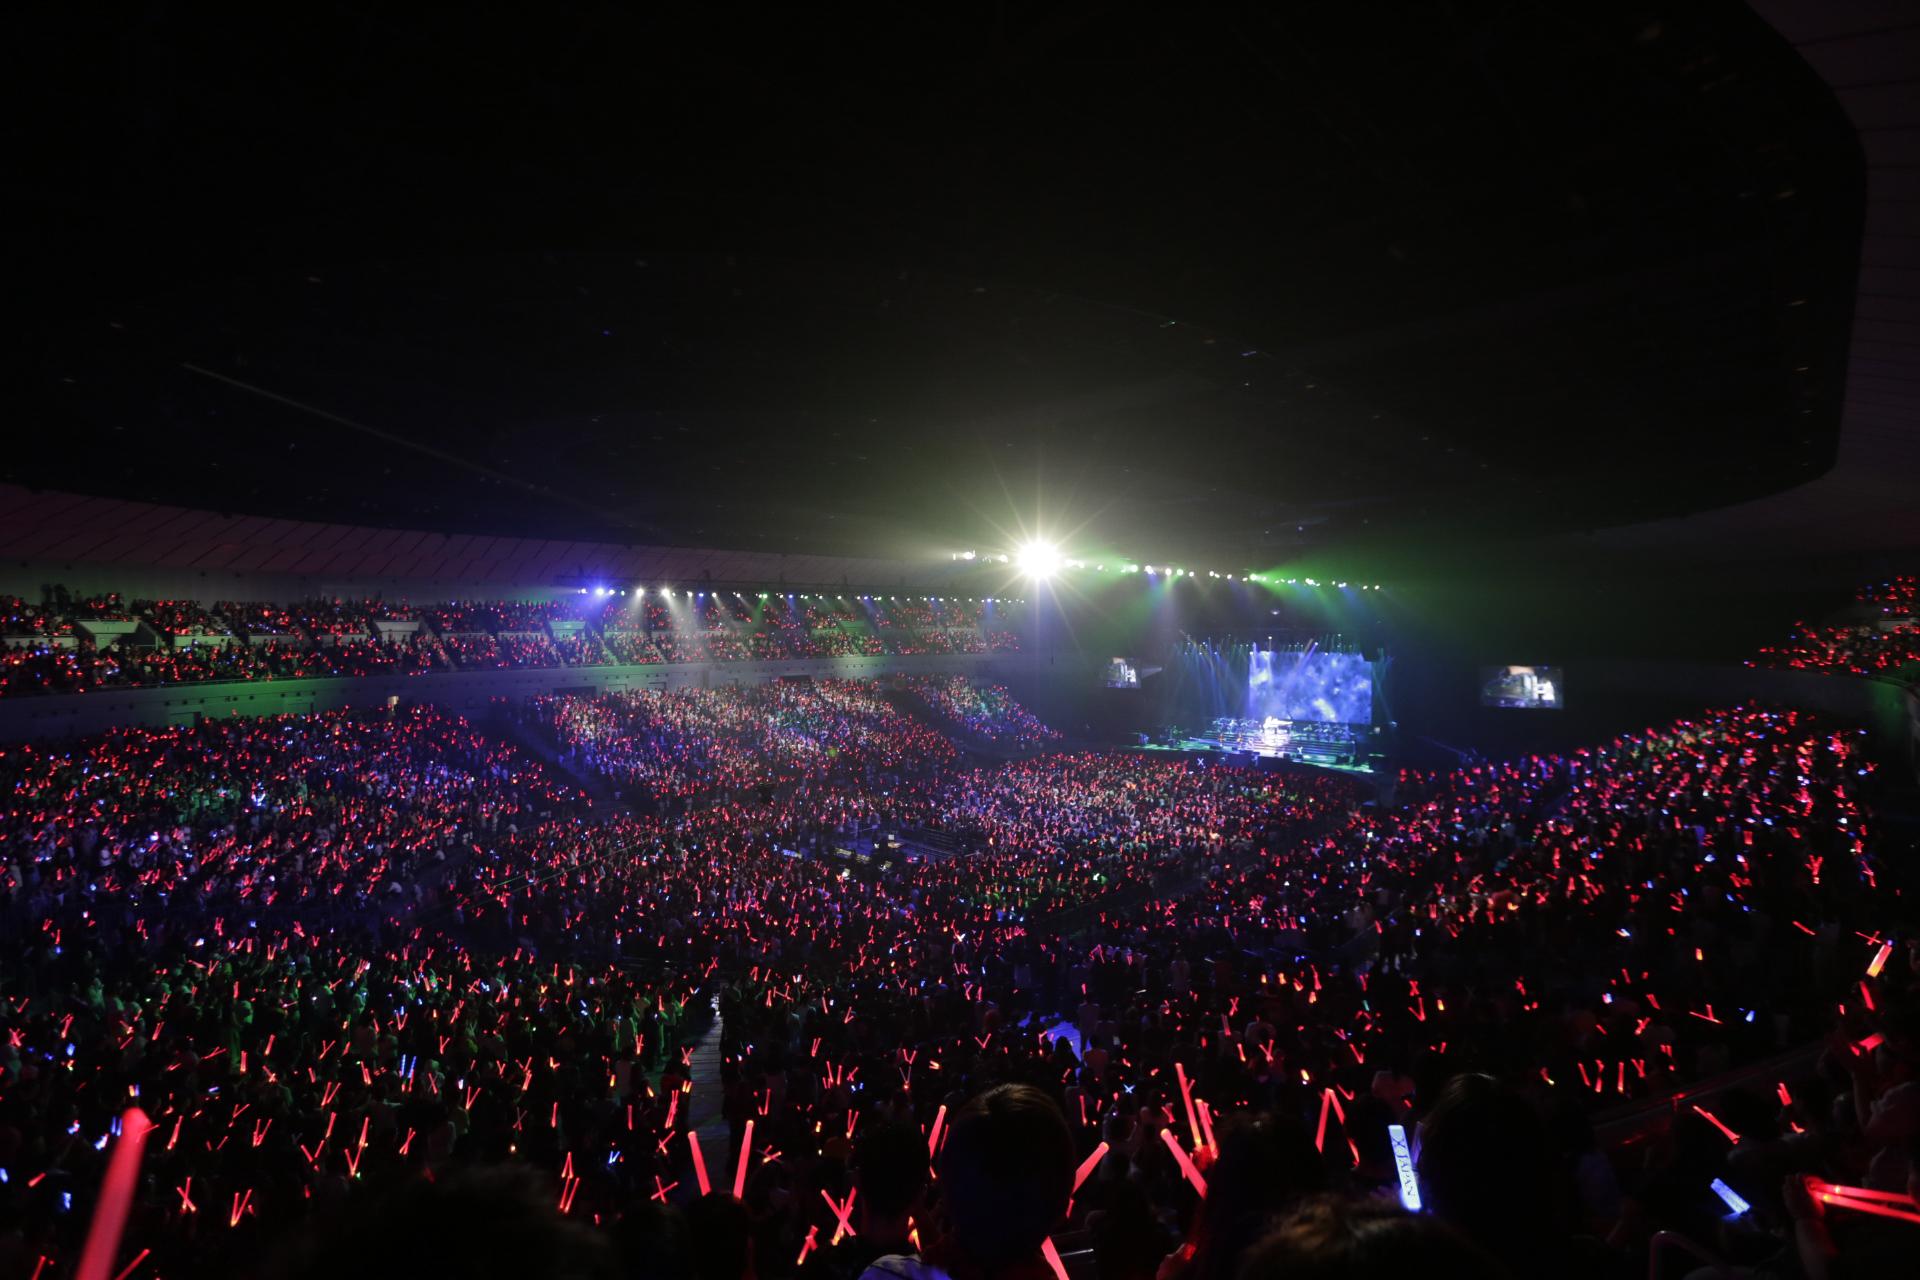 JRock247-X-Japan-Yokohama-Arena-2017-0717-6475